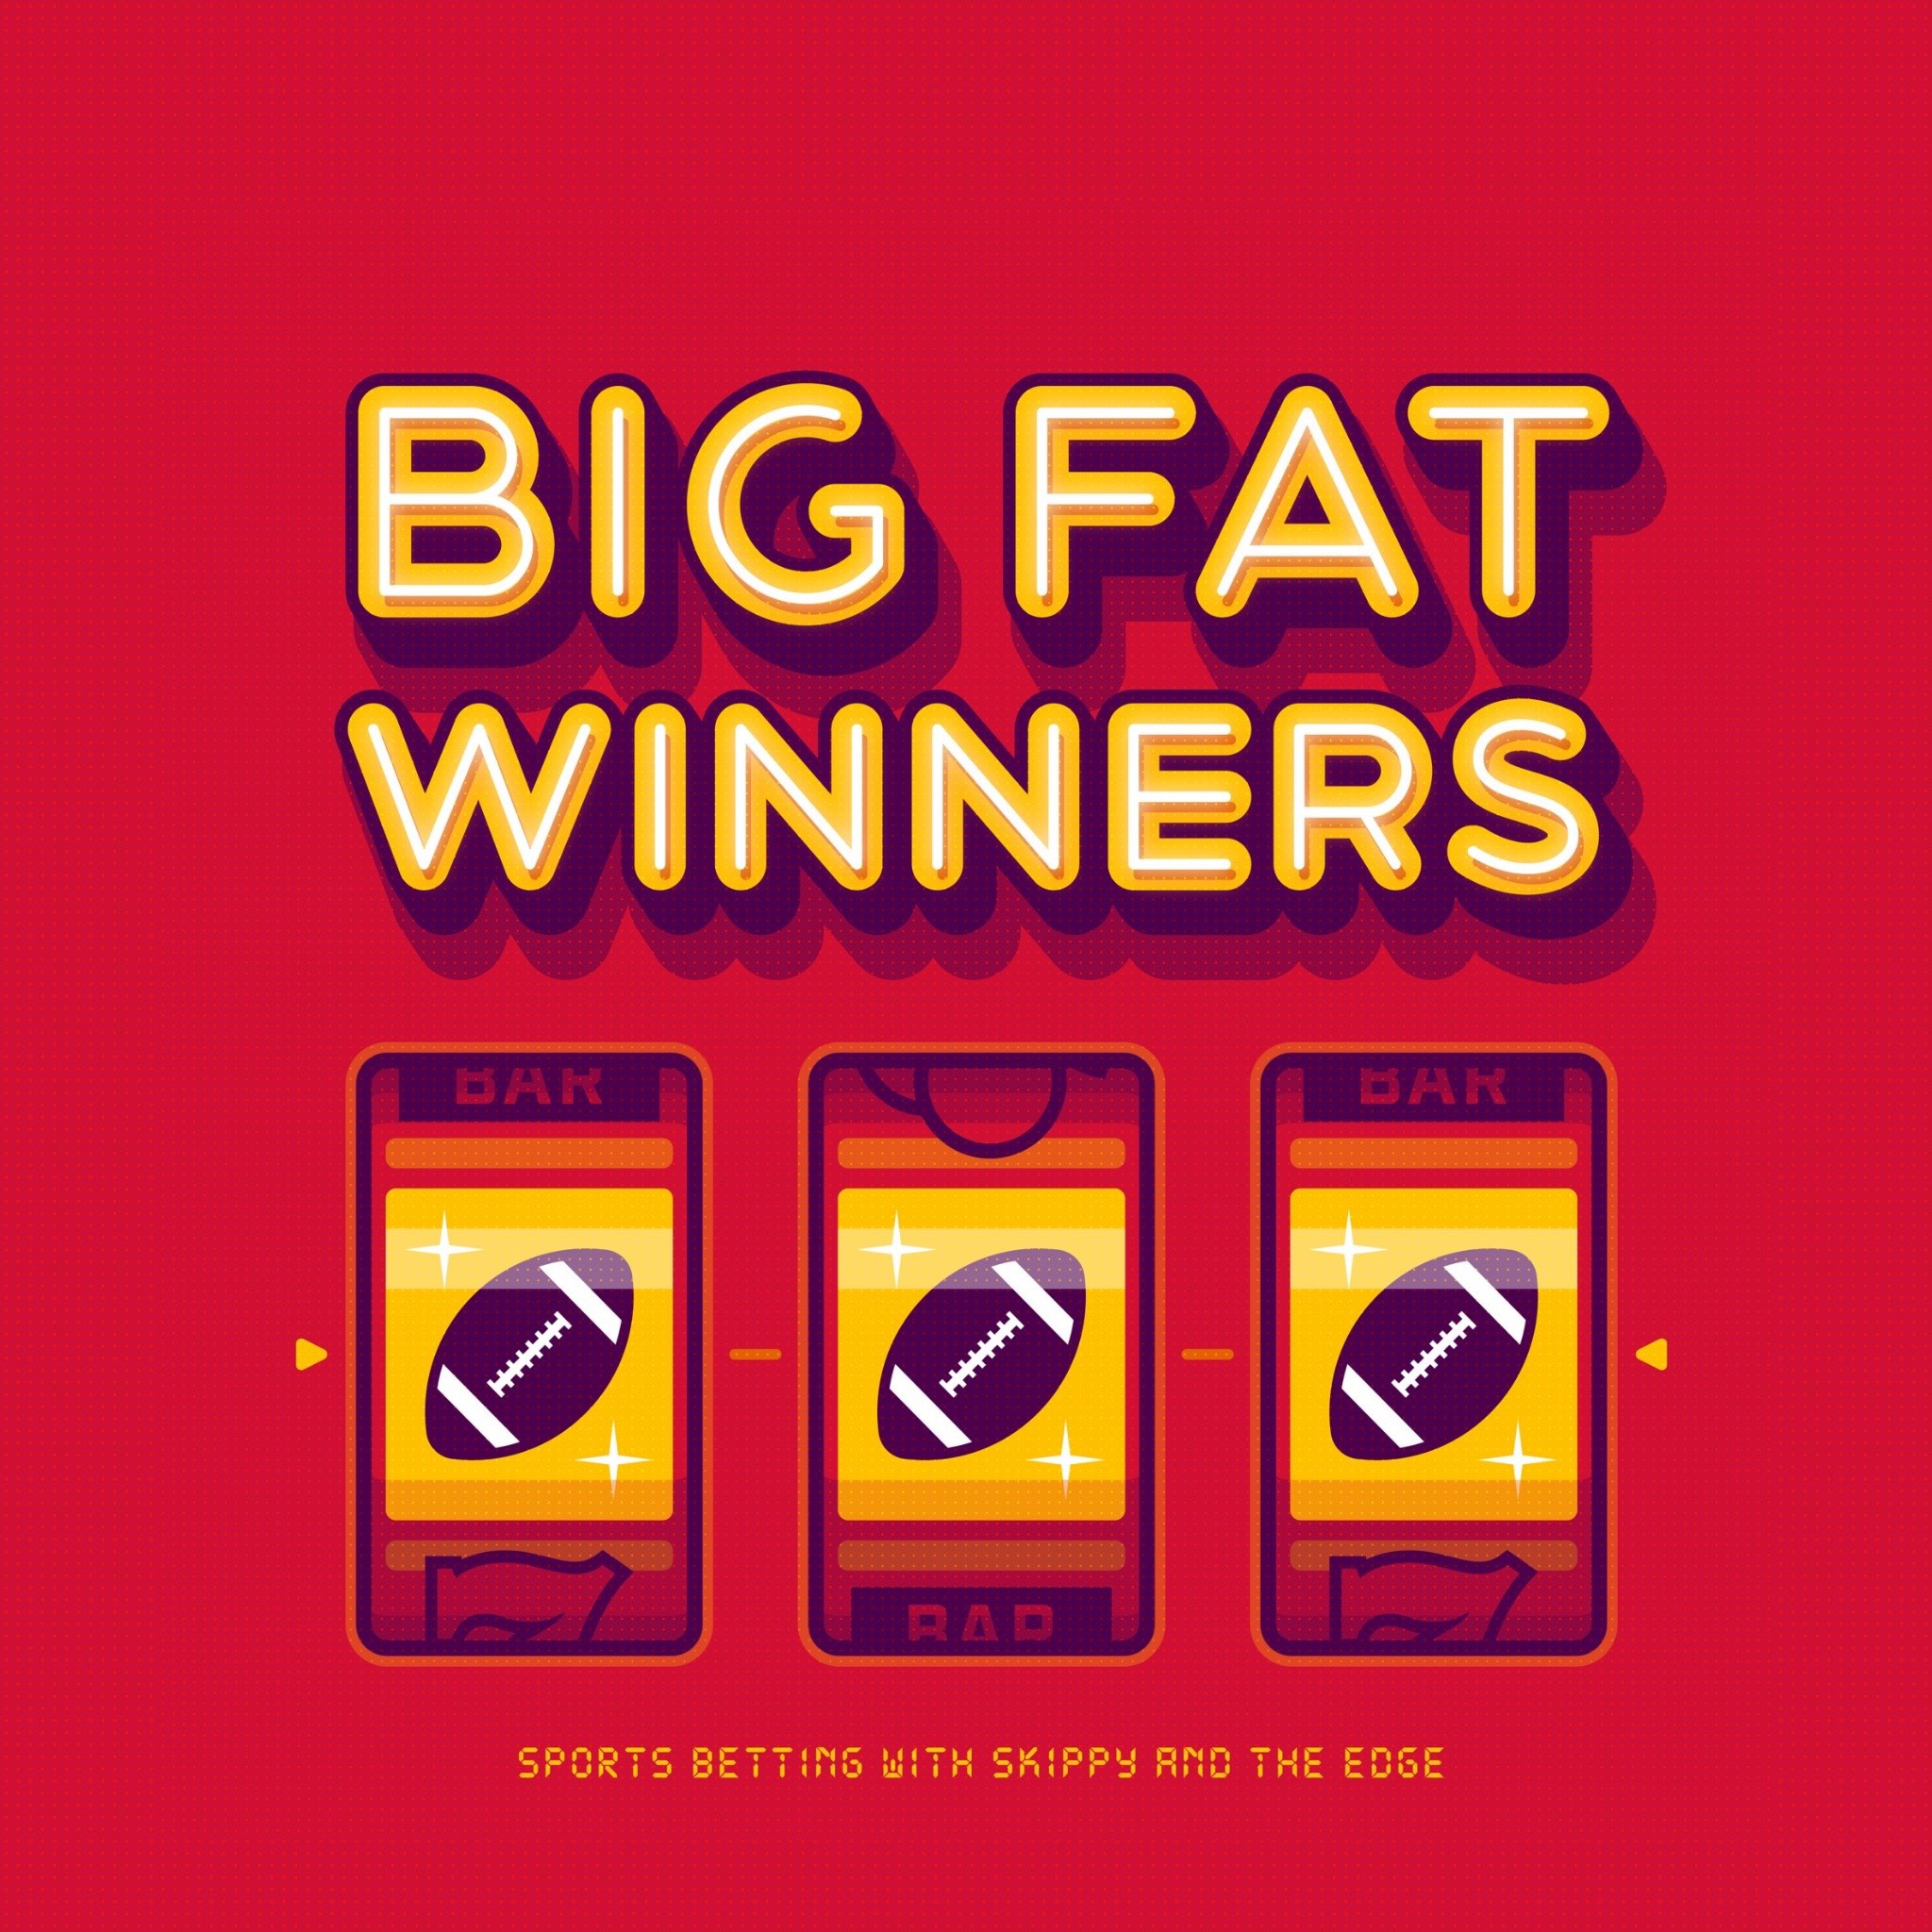 Winners edge sports betting bitcoins logo game